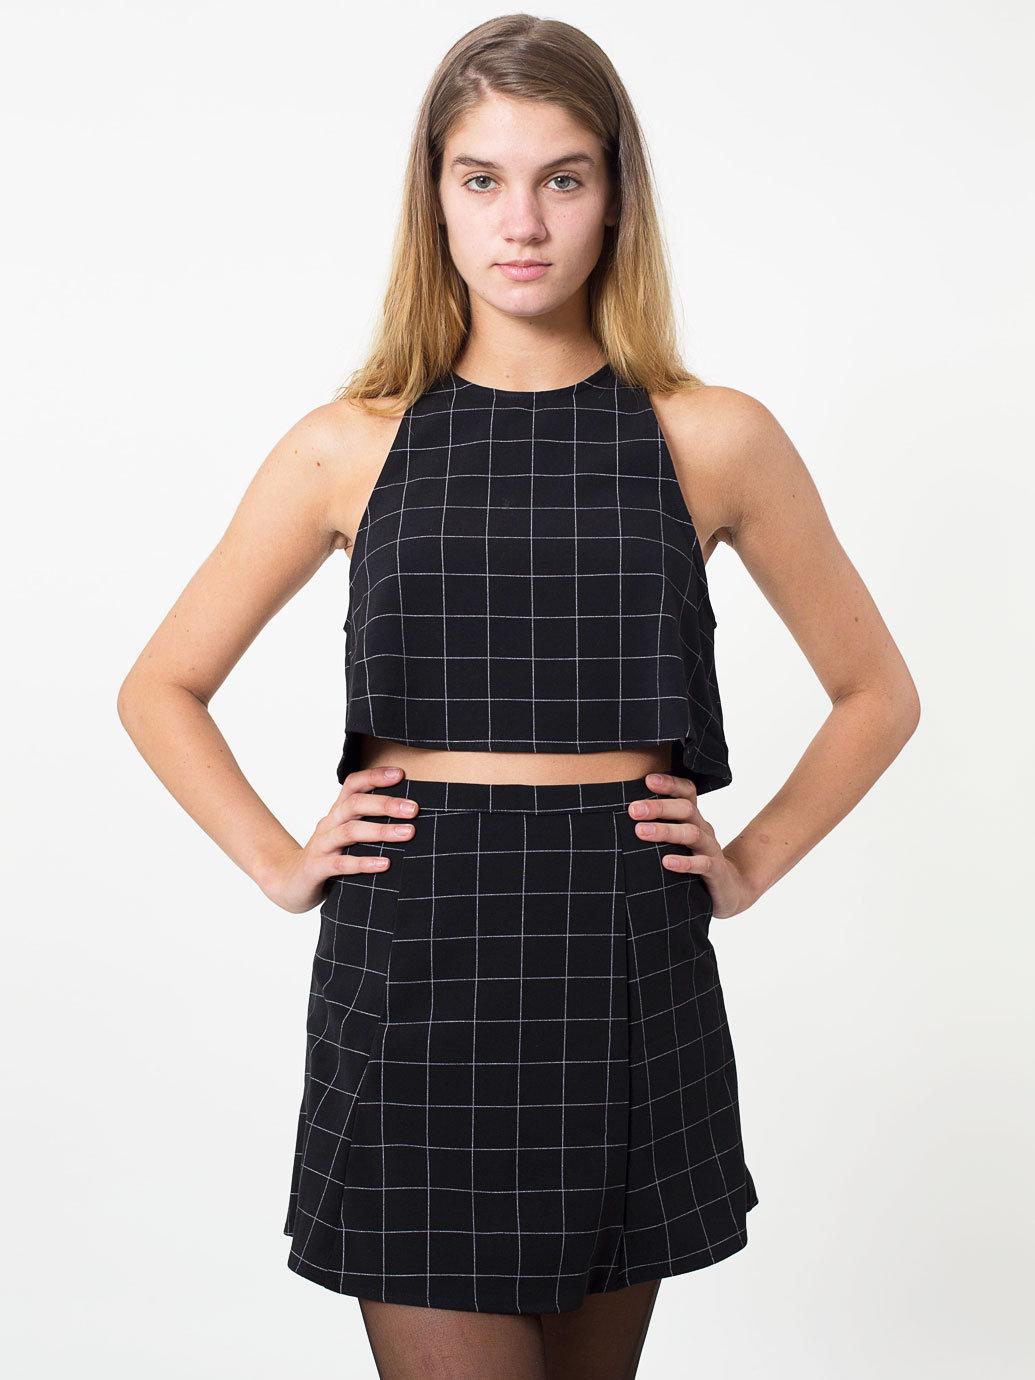 The Grid Print Lulu Mini Skirt | American Apparel